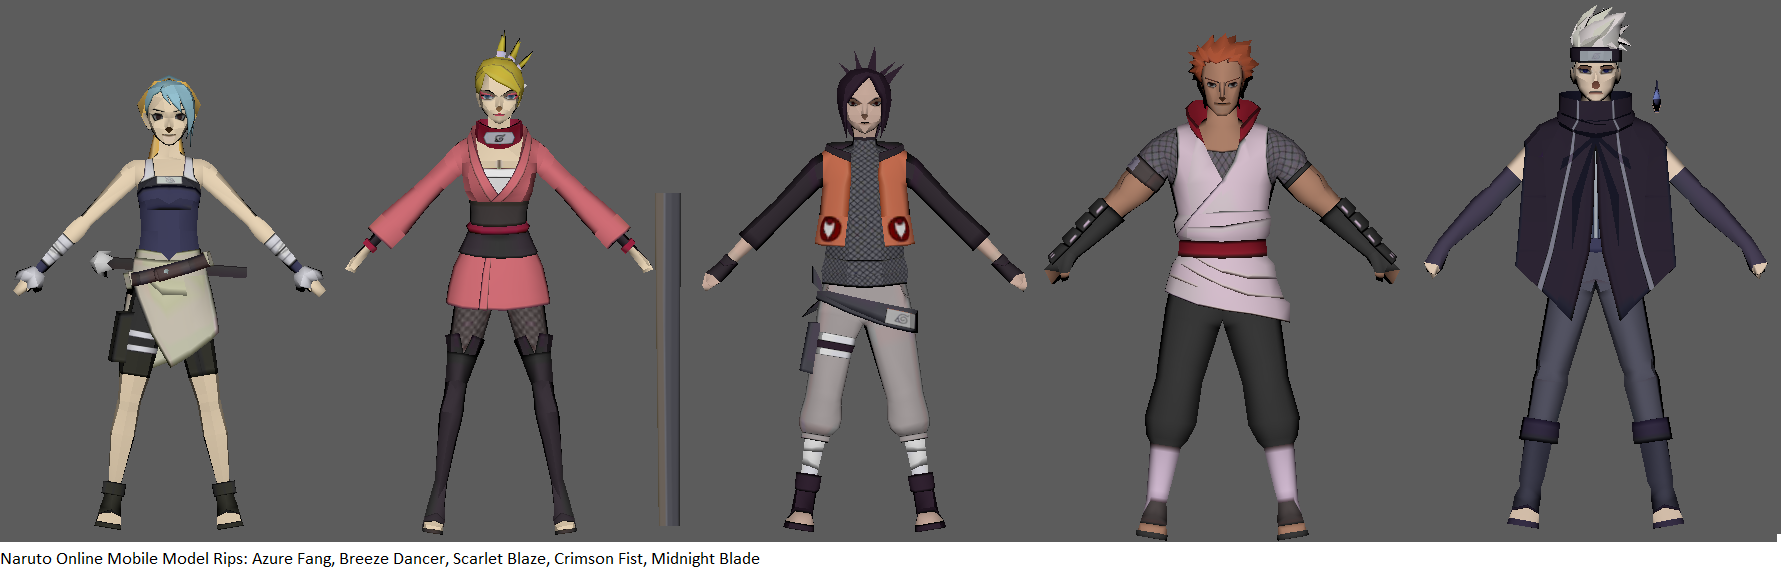 Naruto Online Avatars (Part 1) - static by ChakraWarrior2012